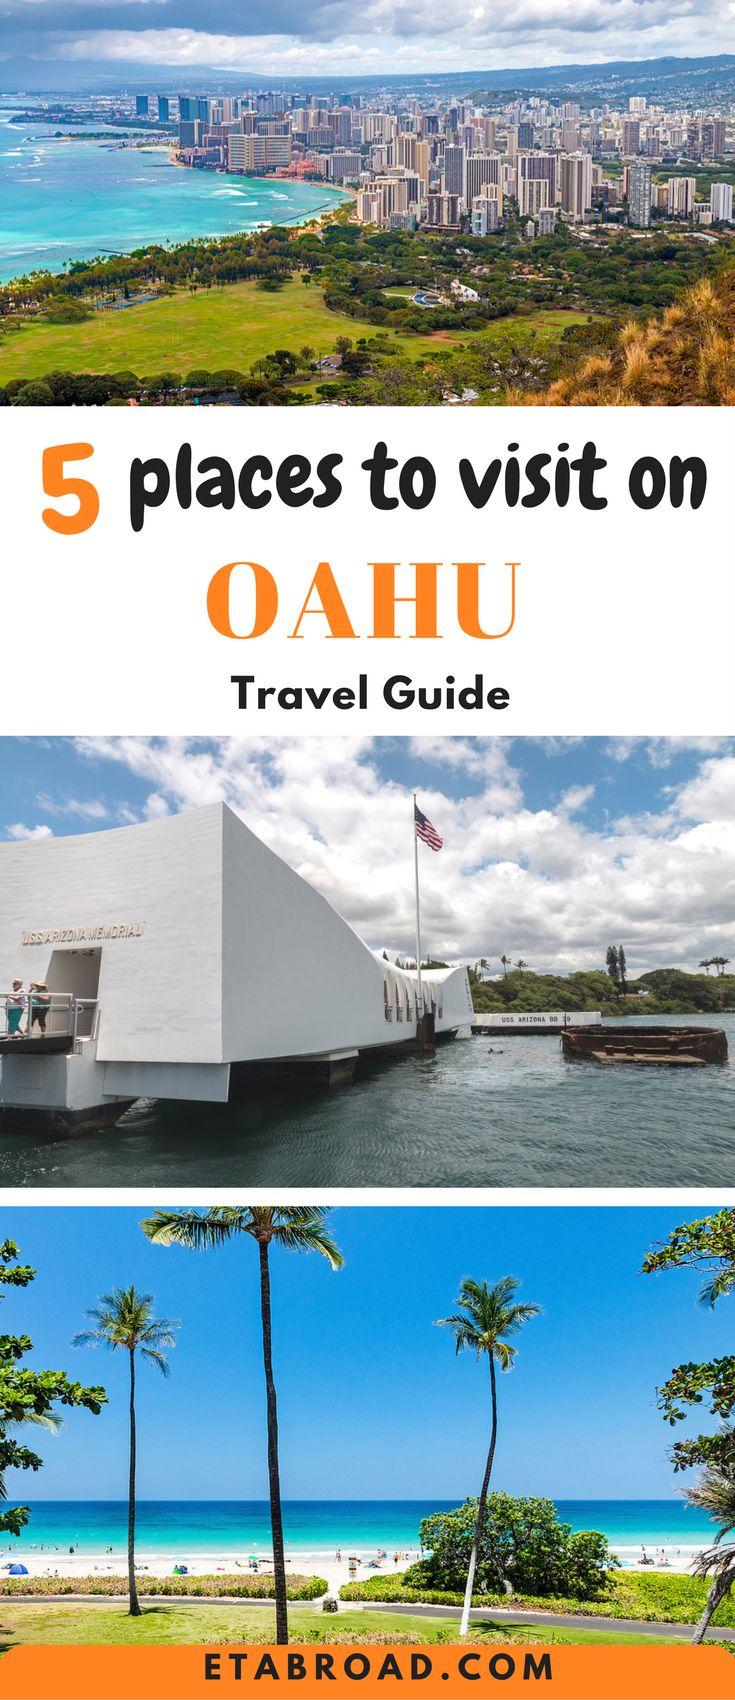 5 things you must do on Oahu, Hawaii